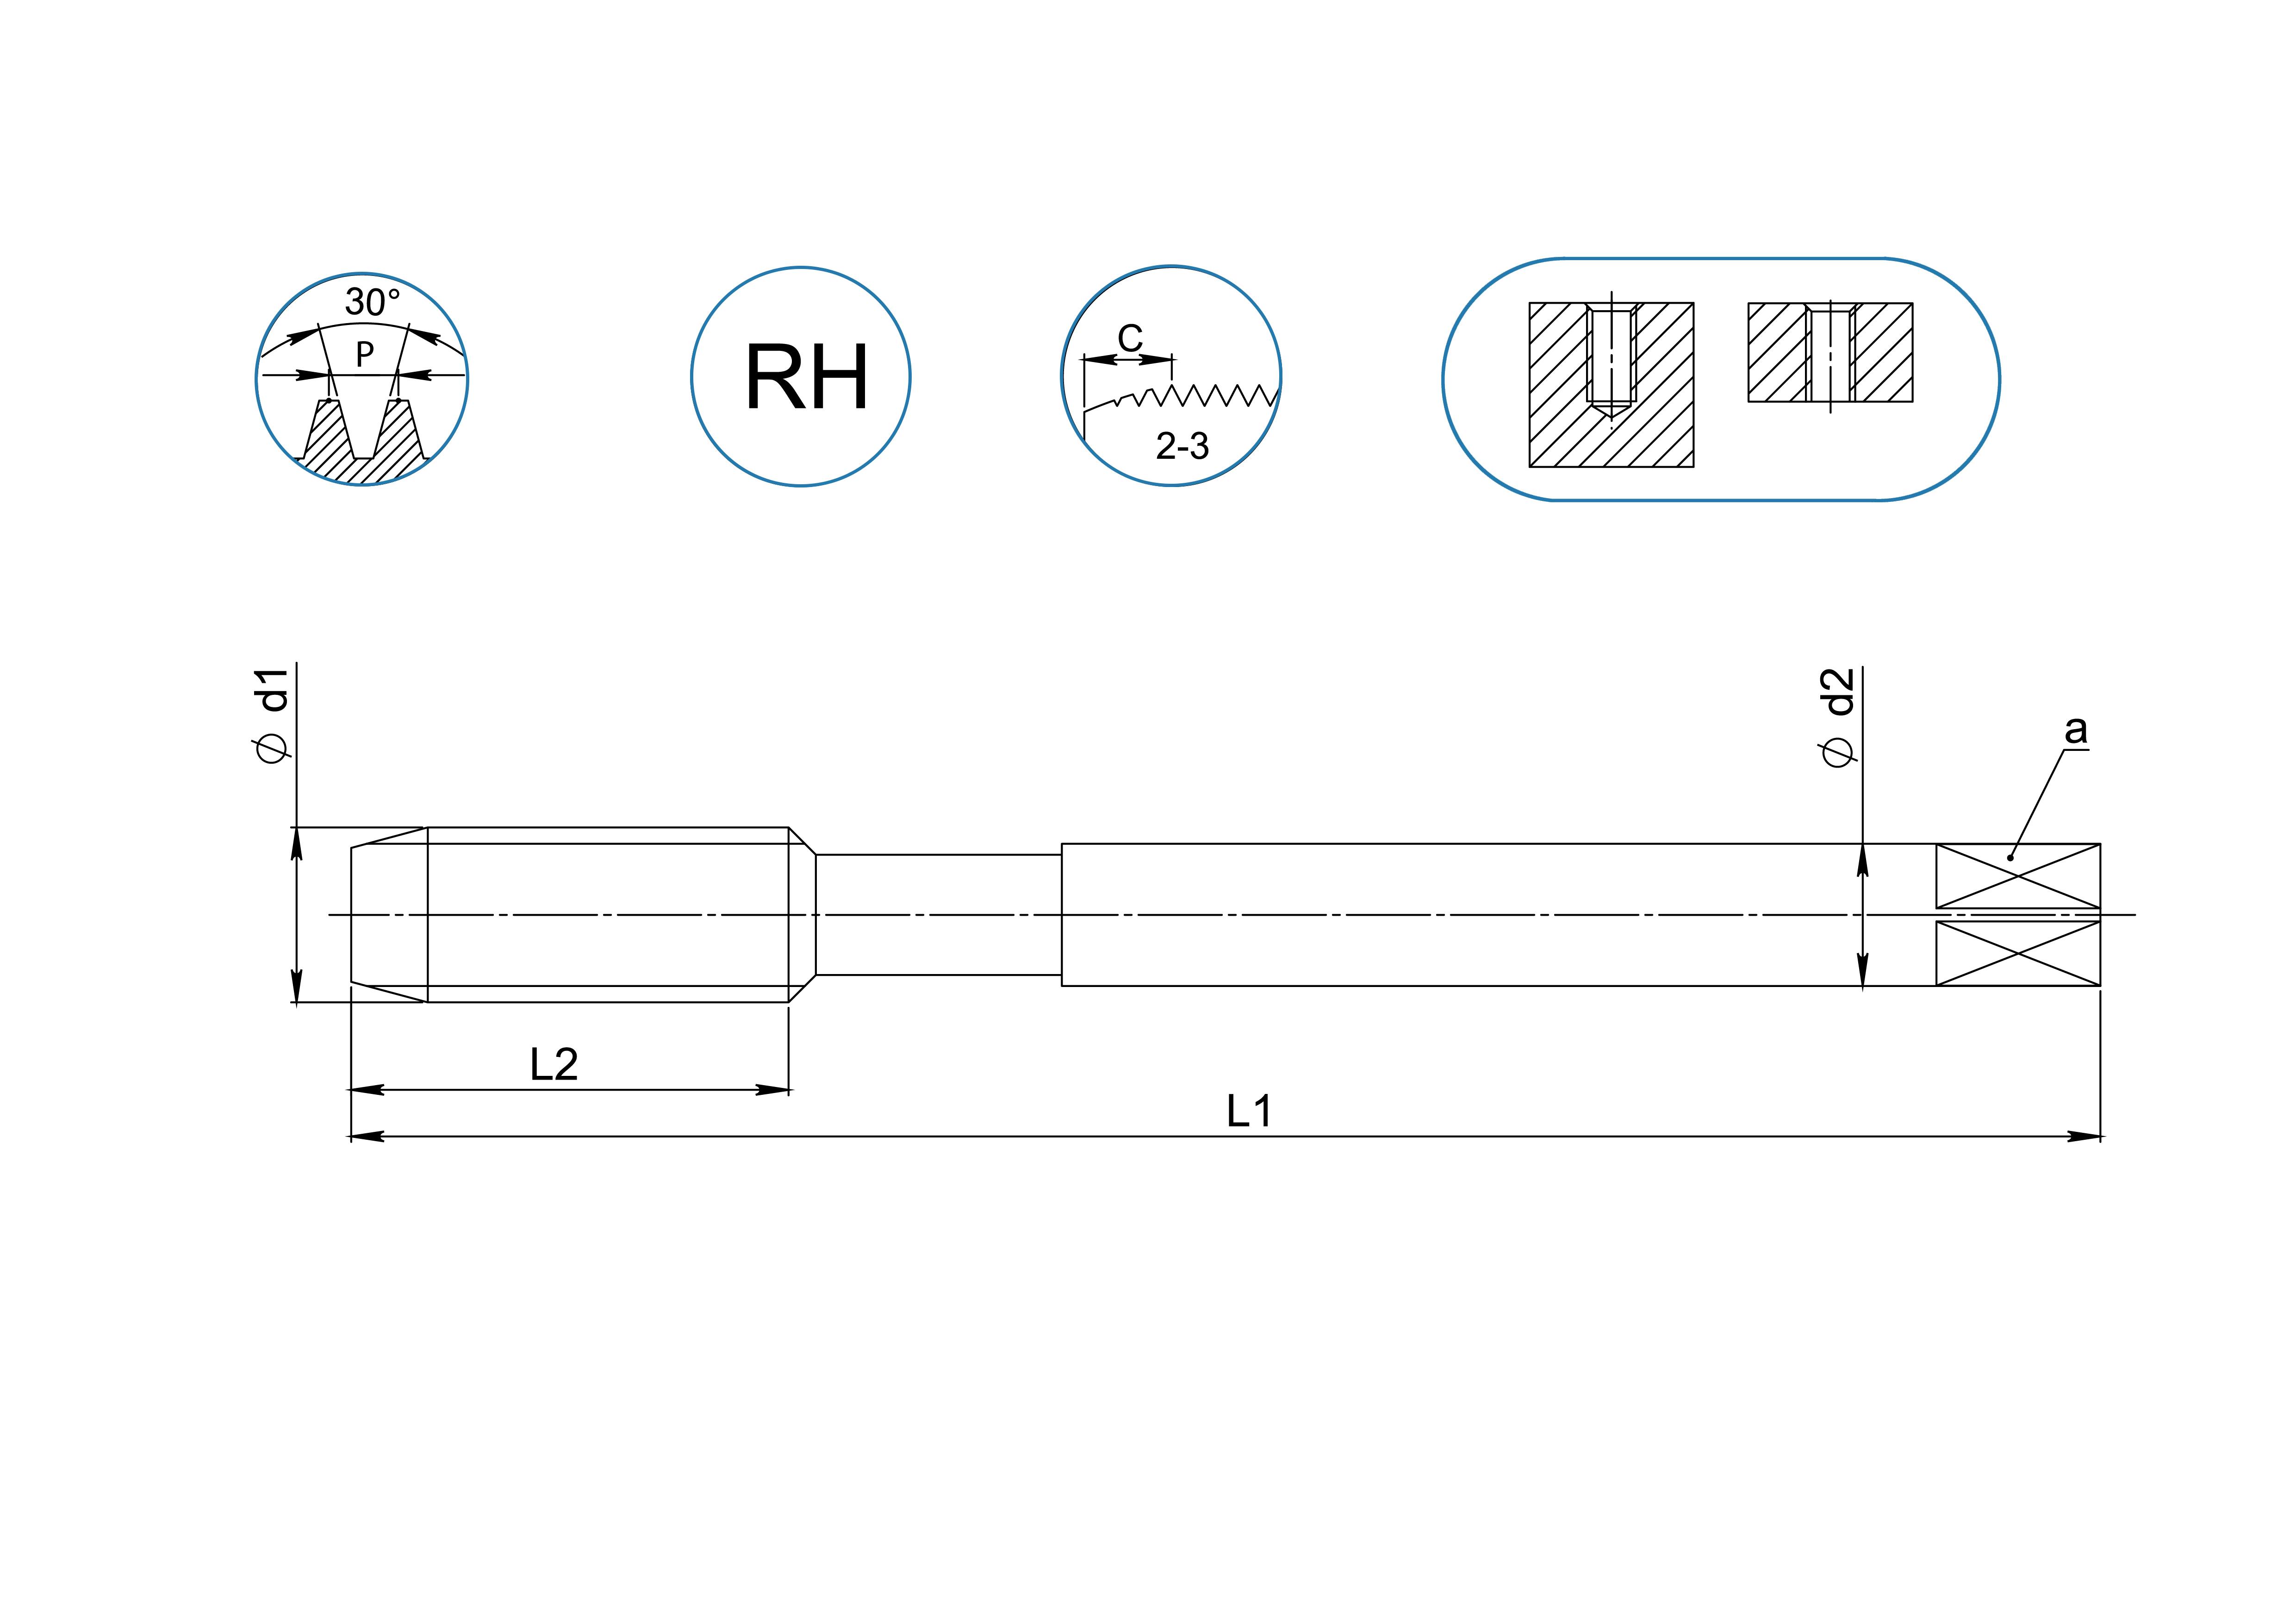 Метчики для резьбы BSW-PG-Tr-Rd | stamo-tools ru